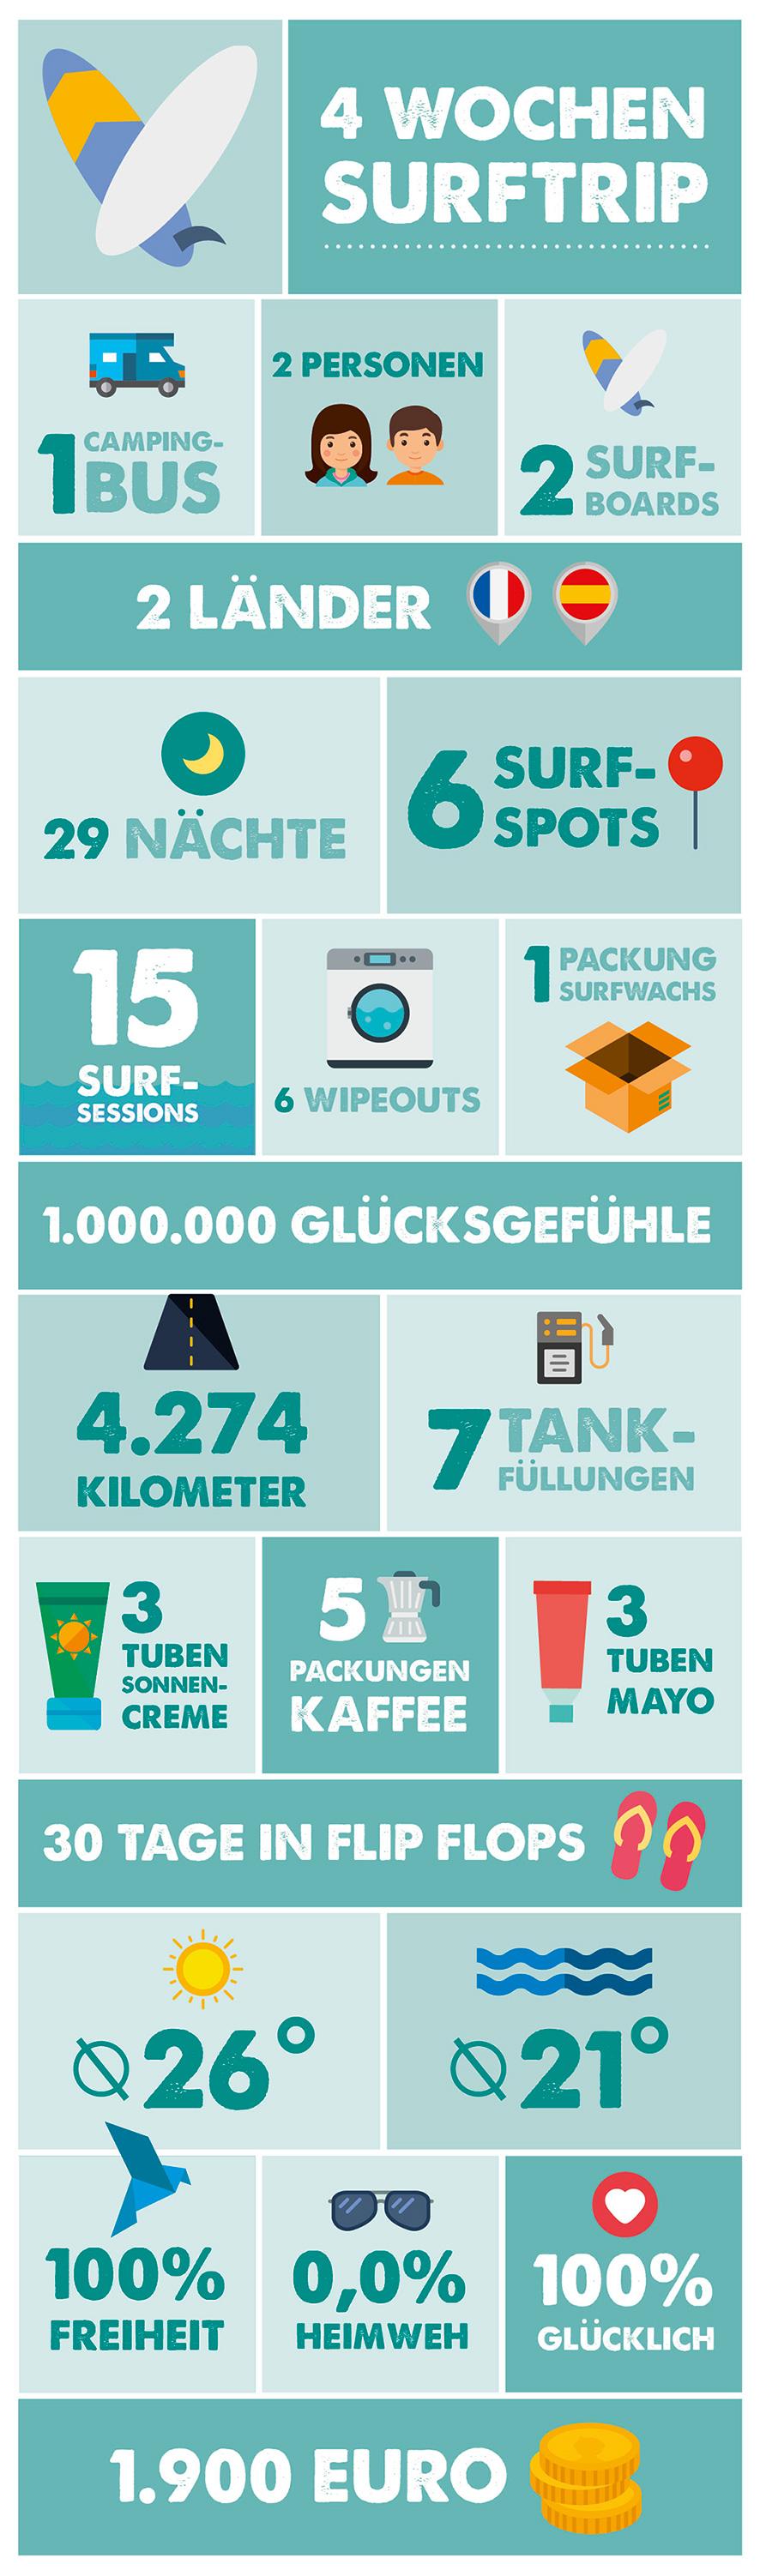 snippets_4-wochen-surftrip-infografik